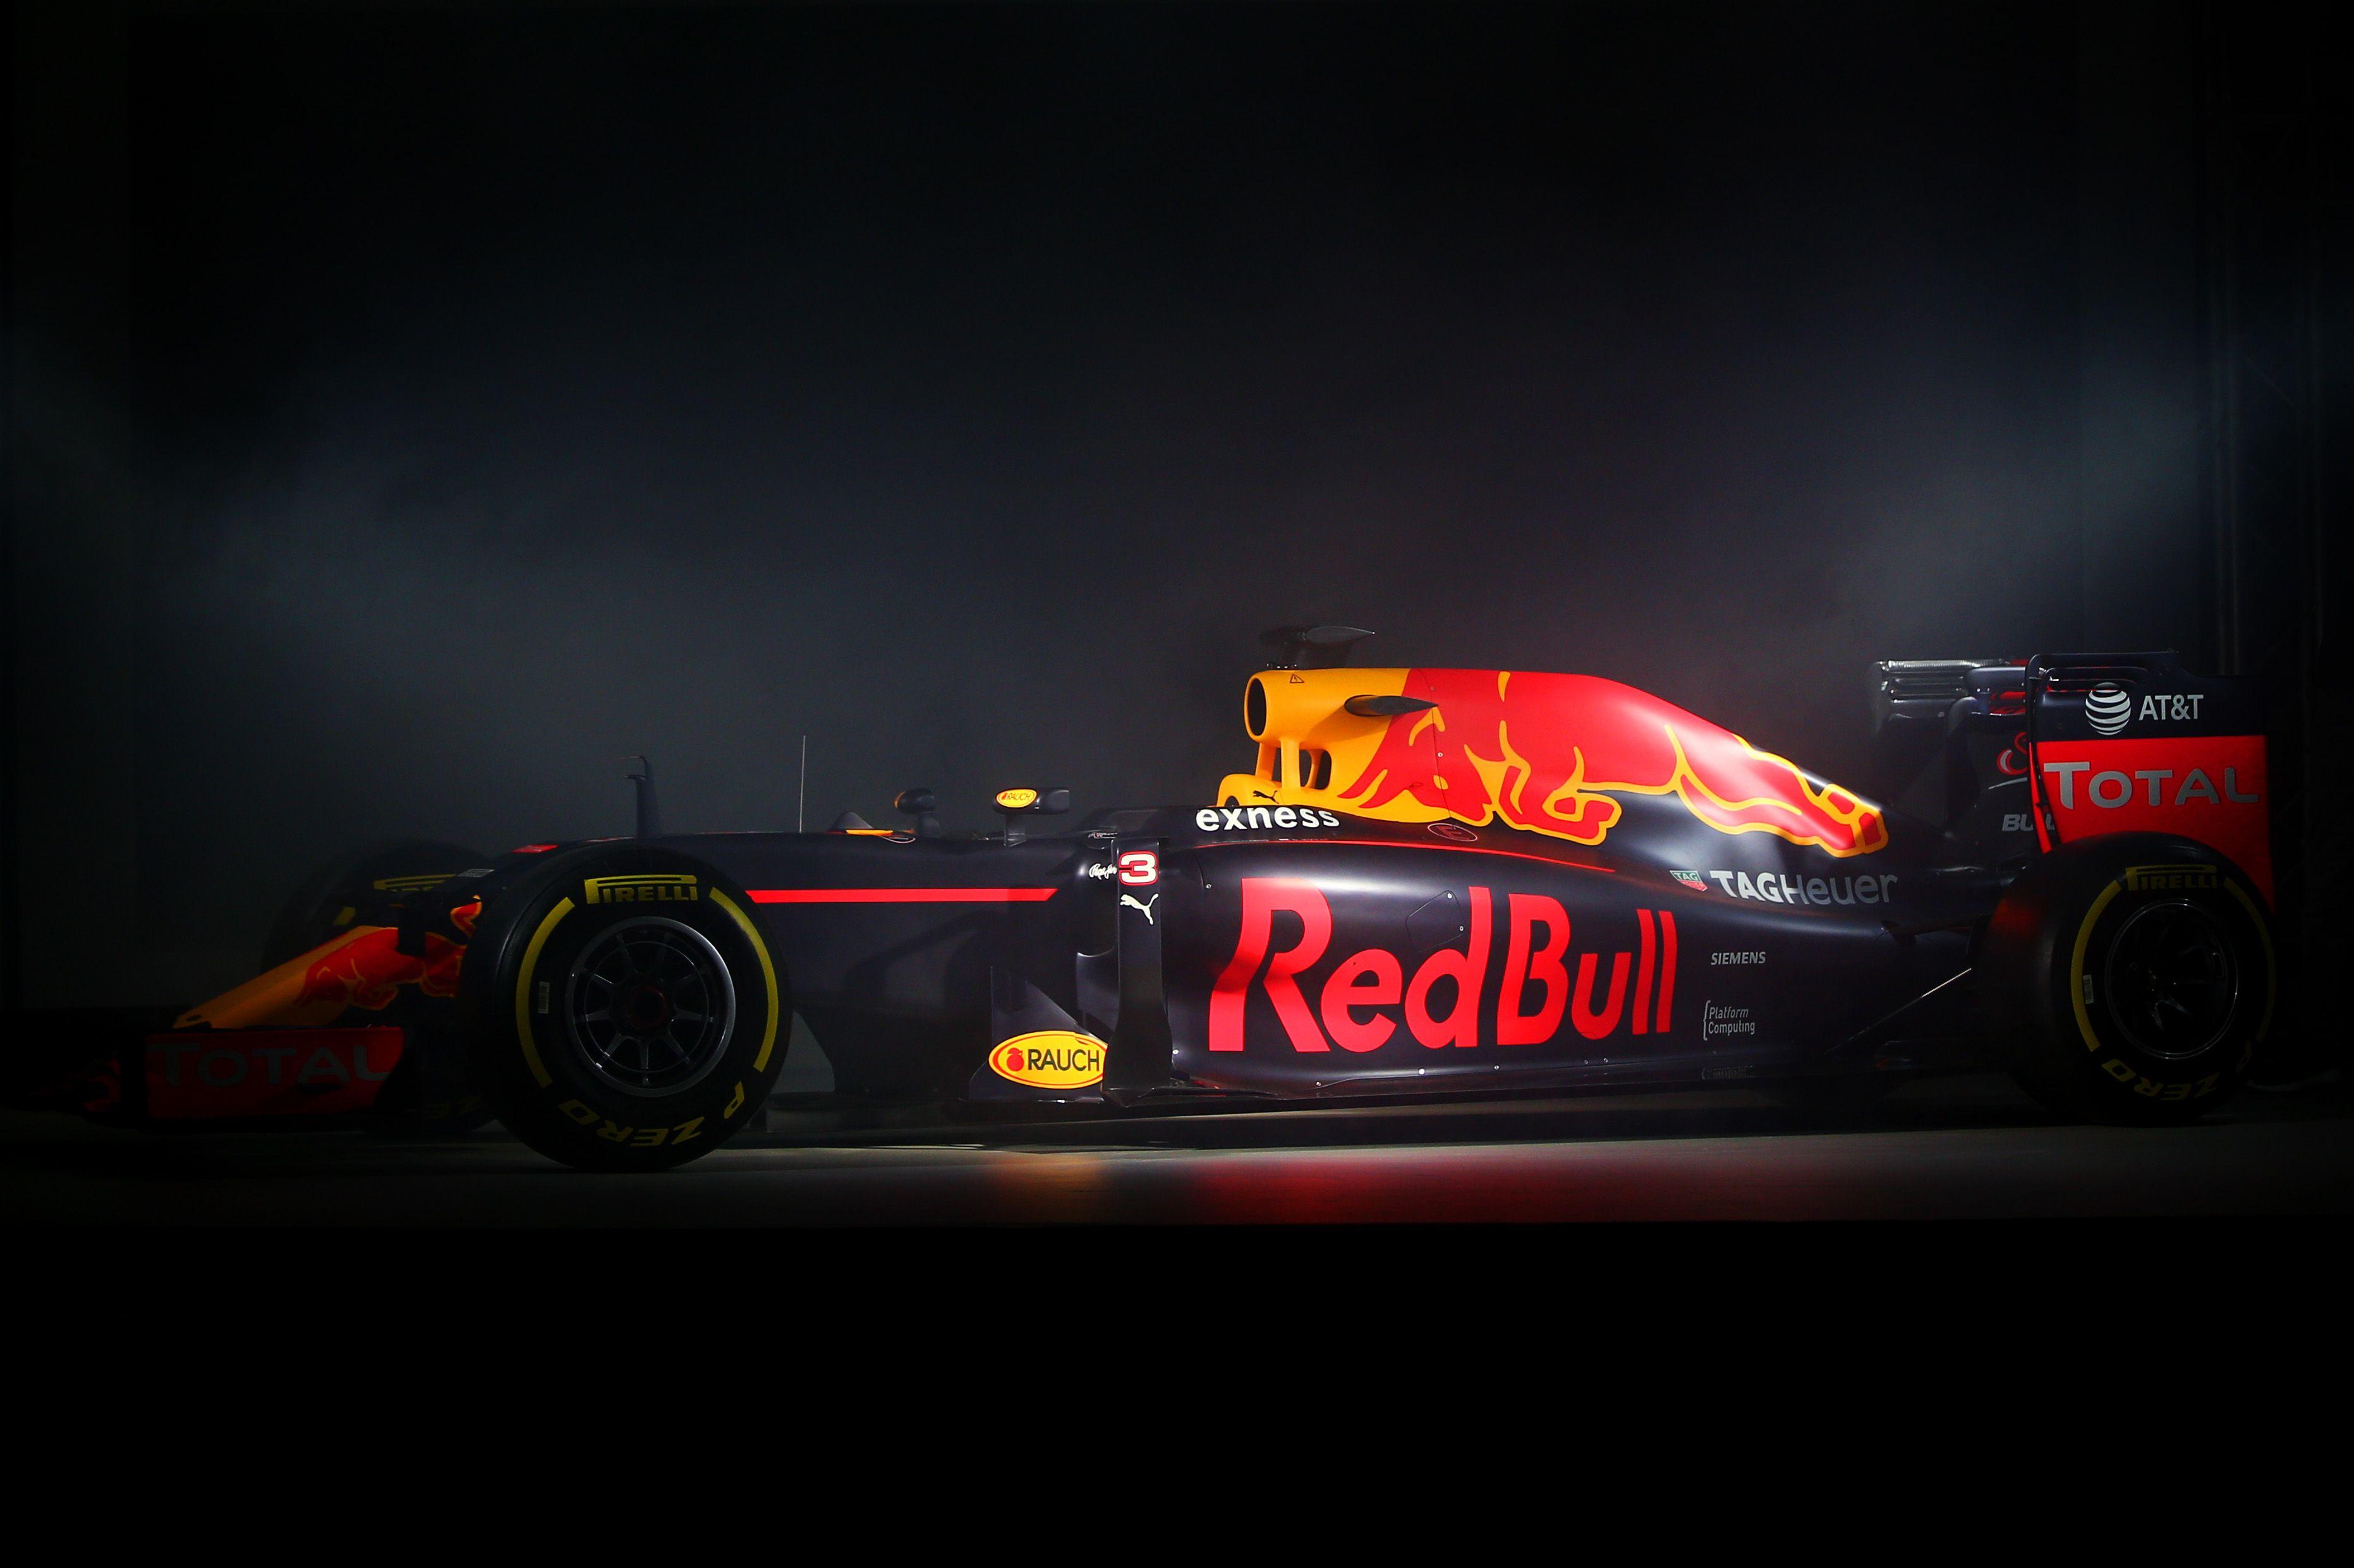 Red Bull Wallpaper High Definition Cars Pinterest